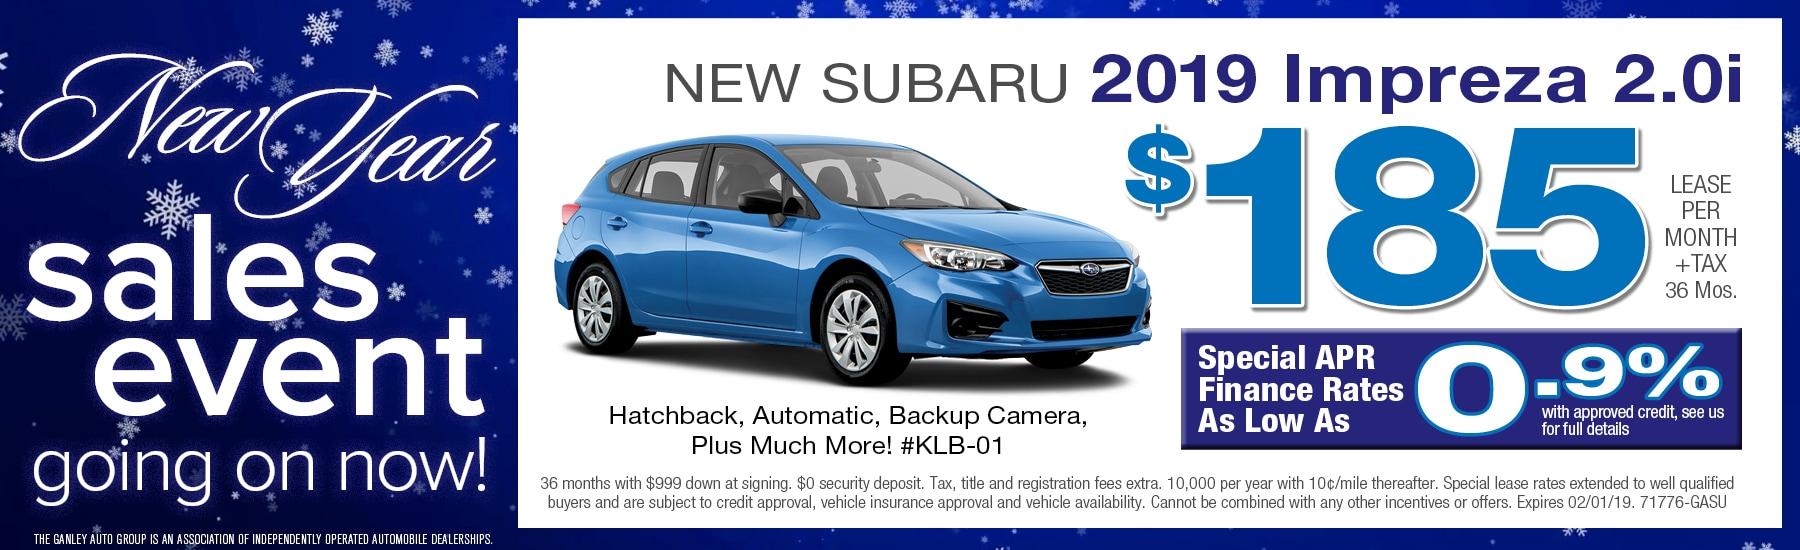 Ganley Subaru Bedford >> Ganley Subaru East | Subaru Dealer in Wickliffe, OH